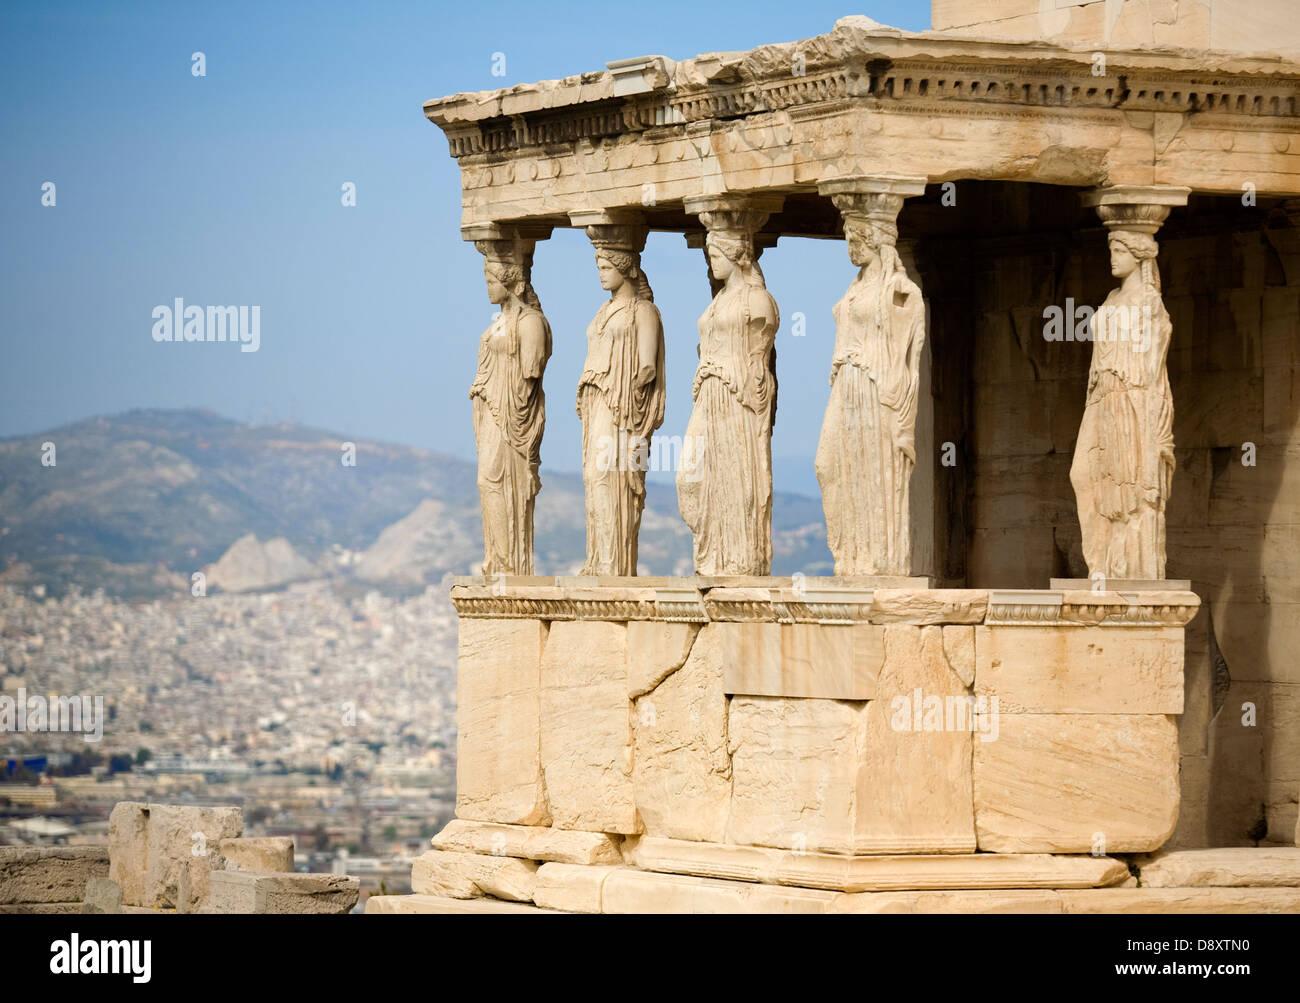 The Caryatid porch of Erechtheion, Acropolis, Athens, Greece, Europe - Stock Image